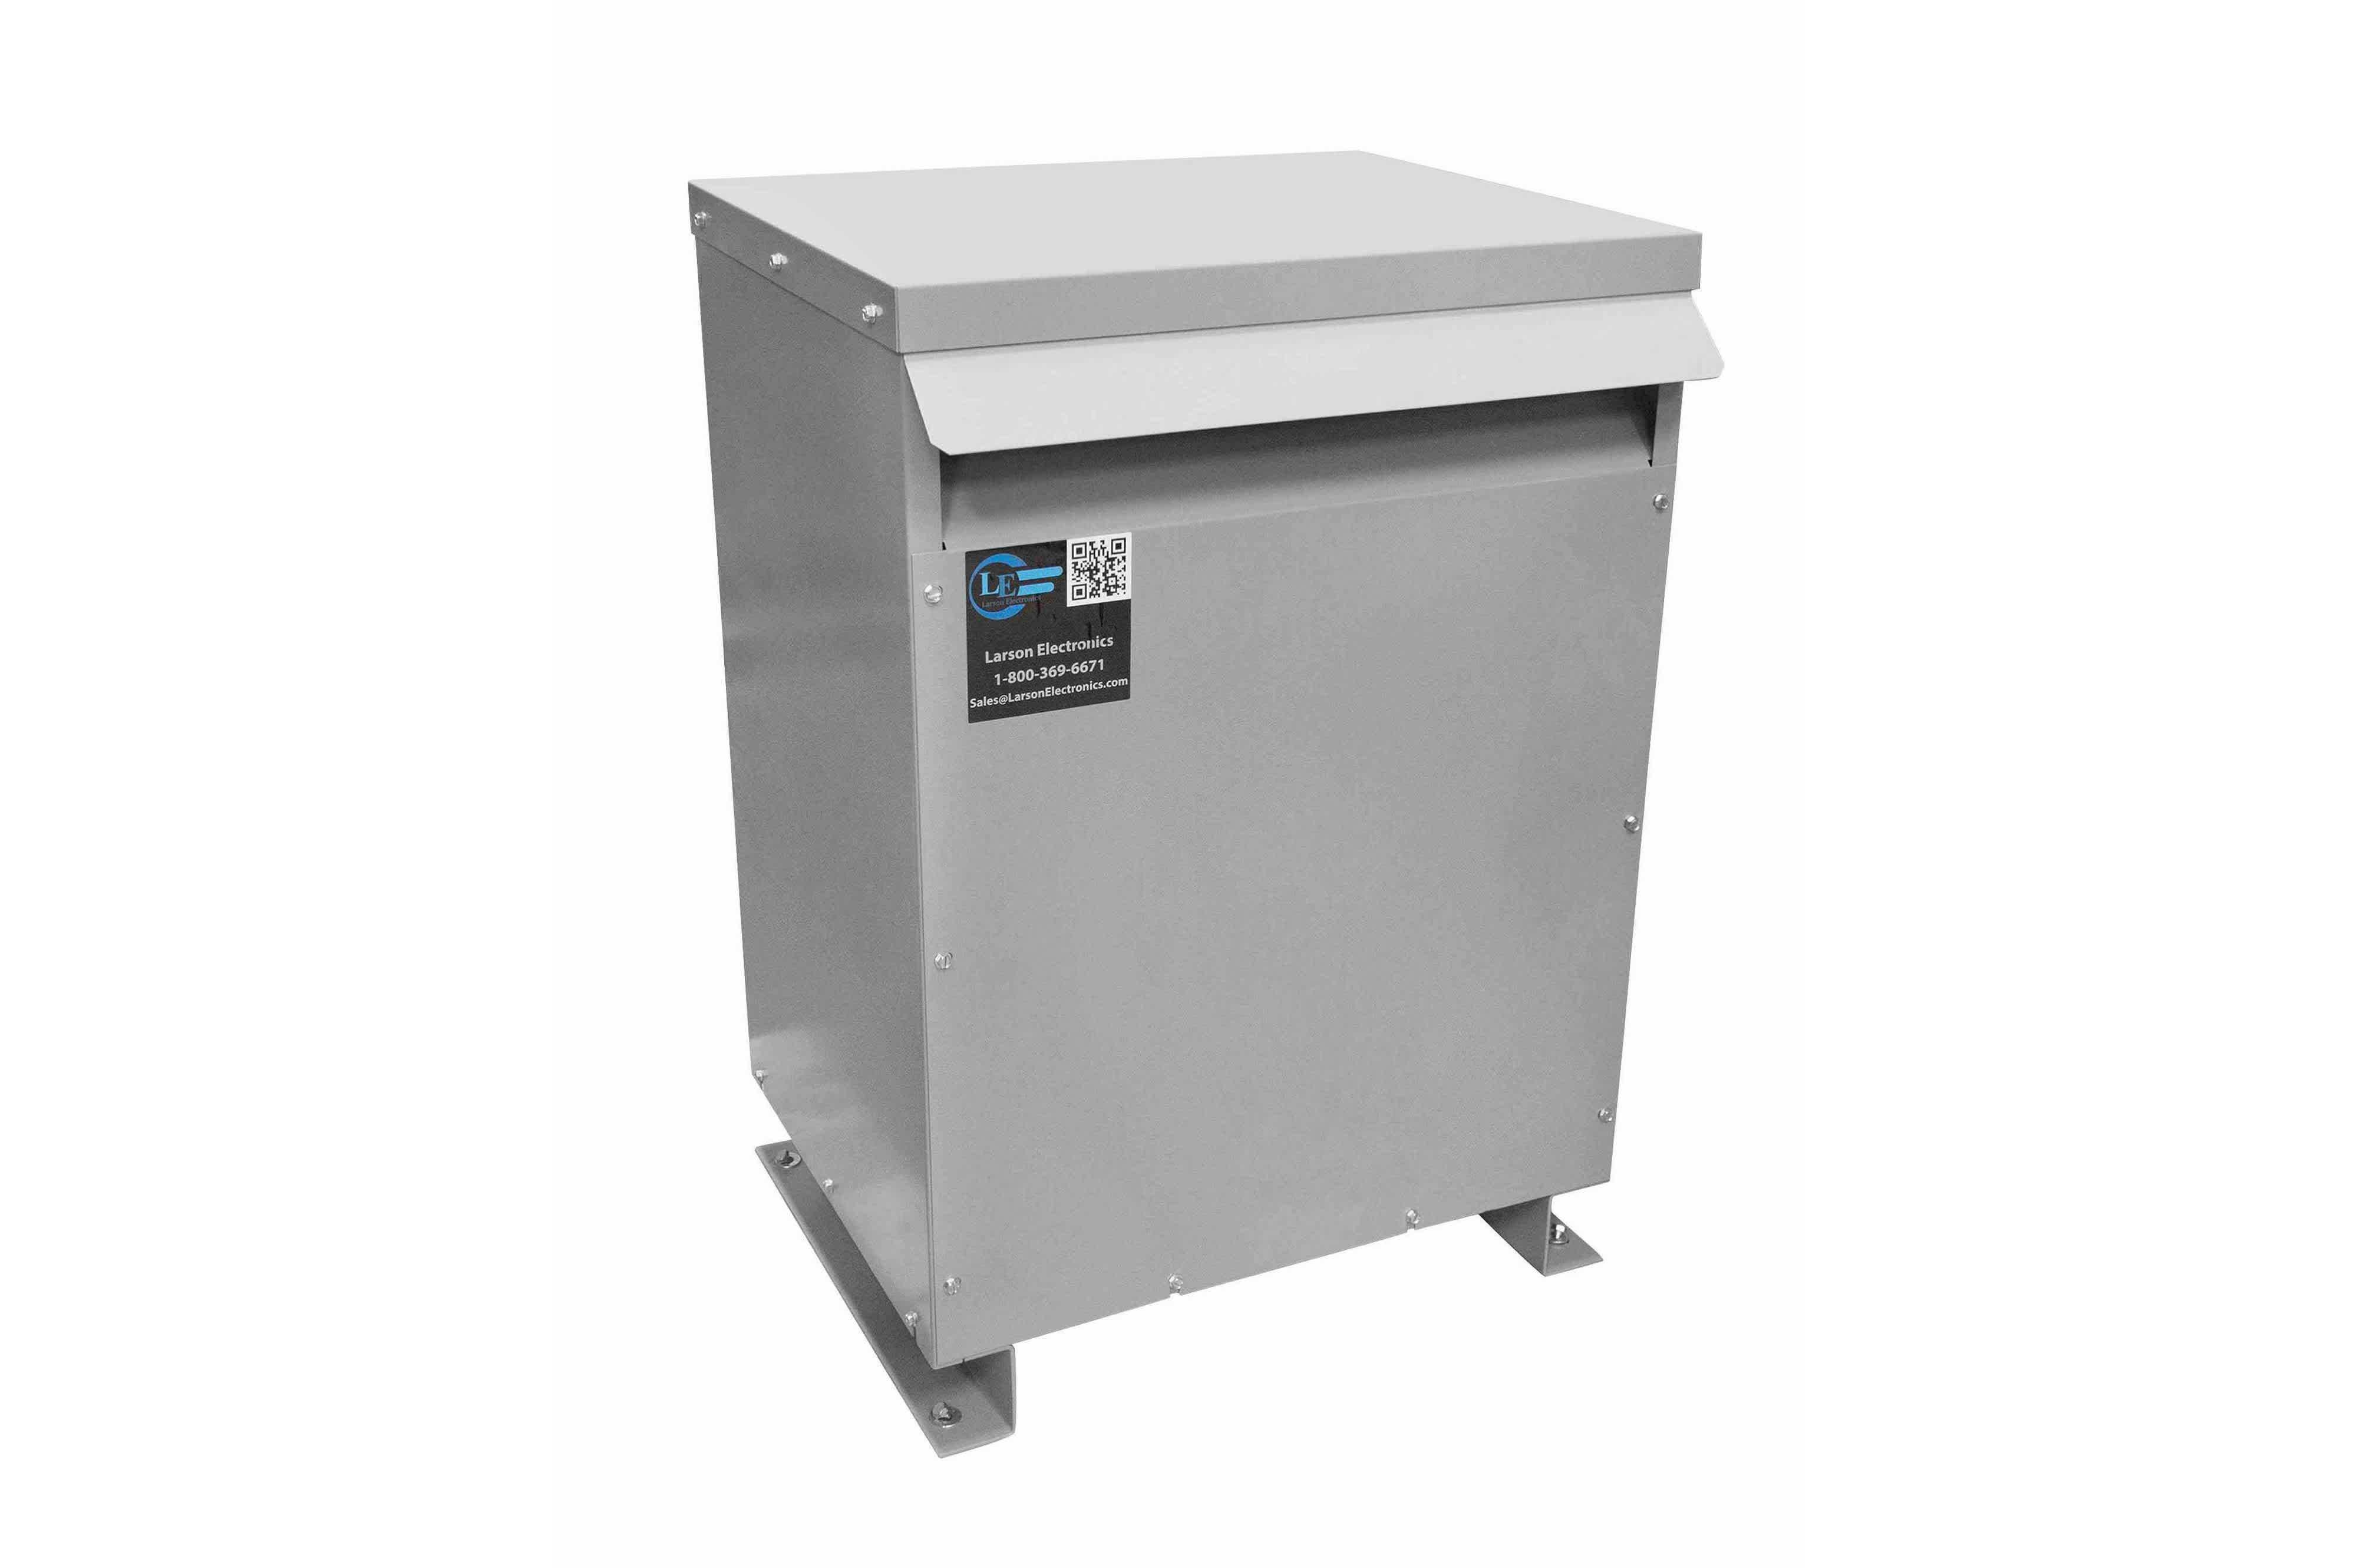 27 kVA 3PH Isolation Transformer, 460V Wye Primary, 600V Delta Secondary, N3R, Ventilated, 60 Hz